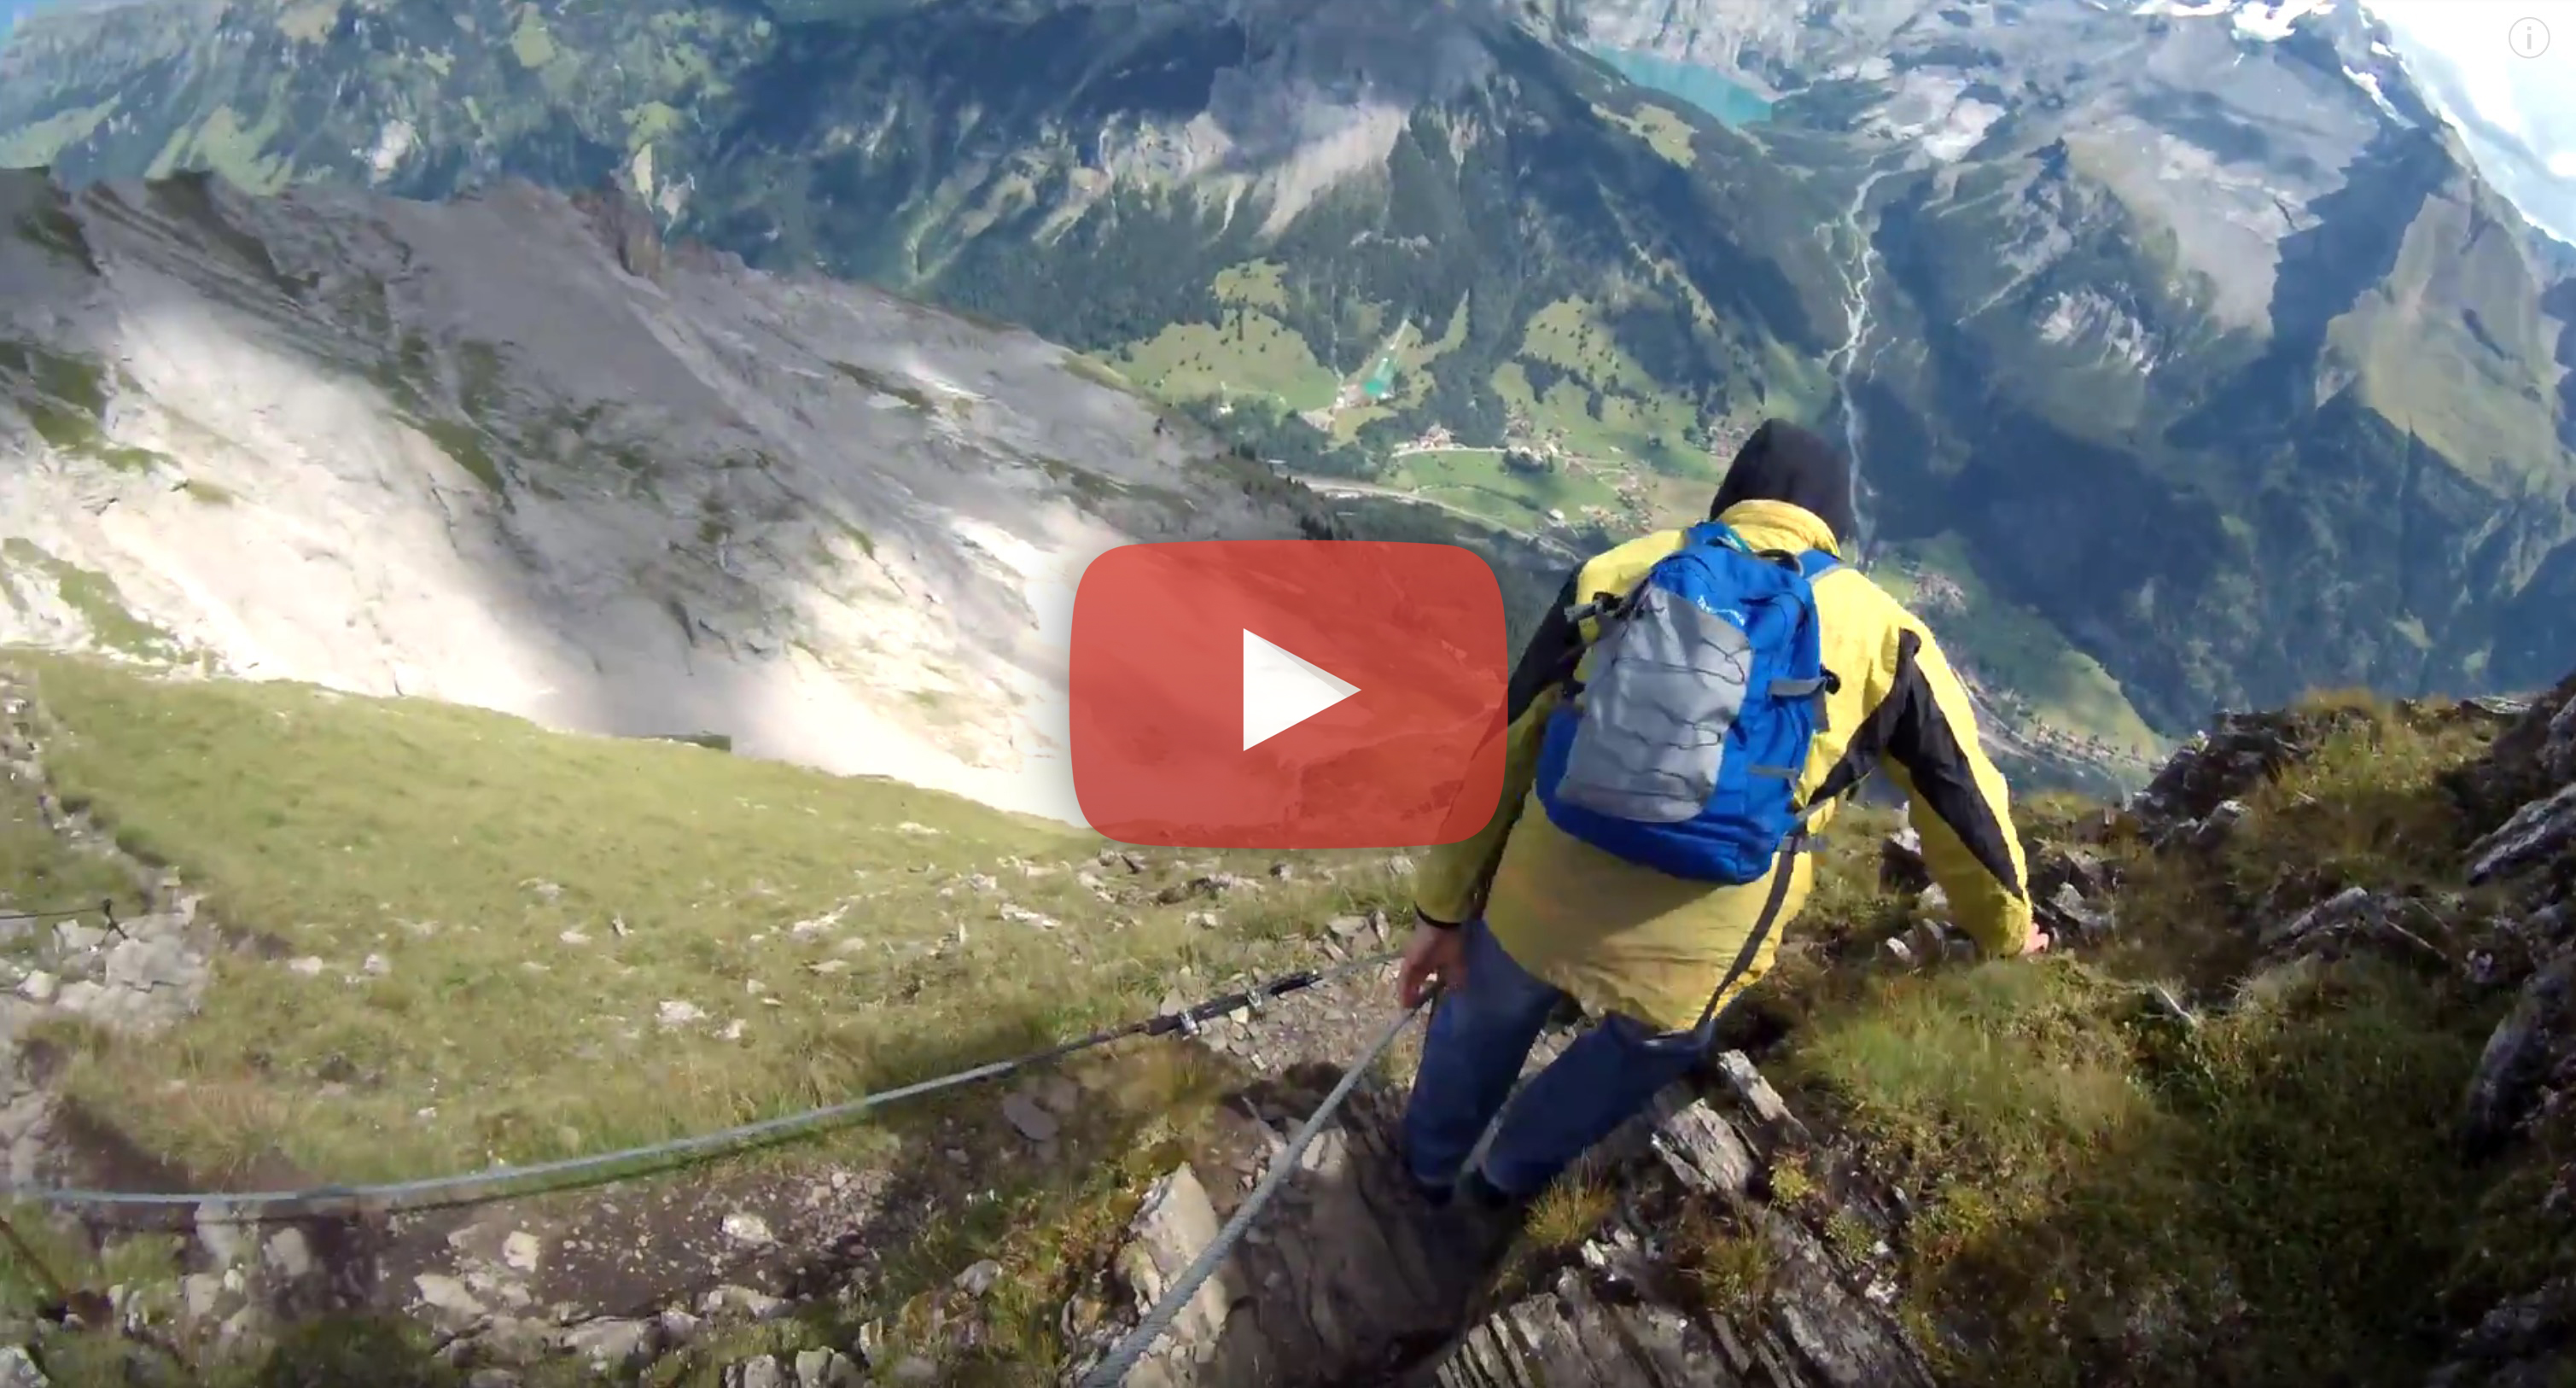 With DJI Mavic Pro and Easypix BlackHawk 4k in the Swiss Alps